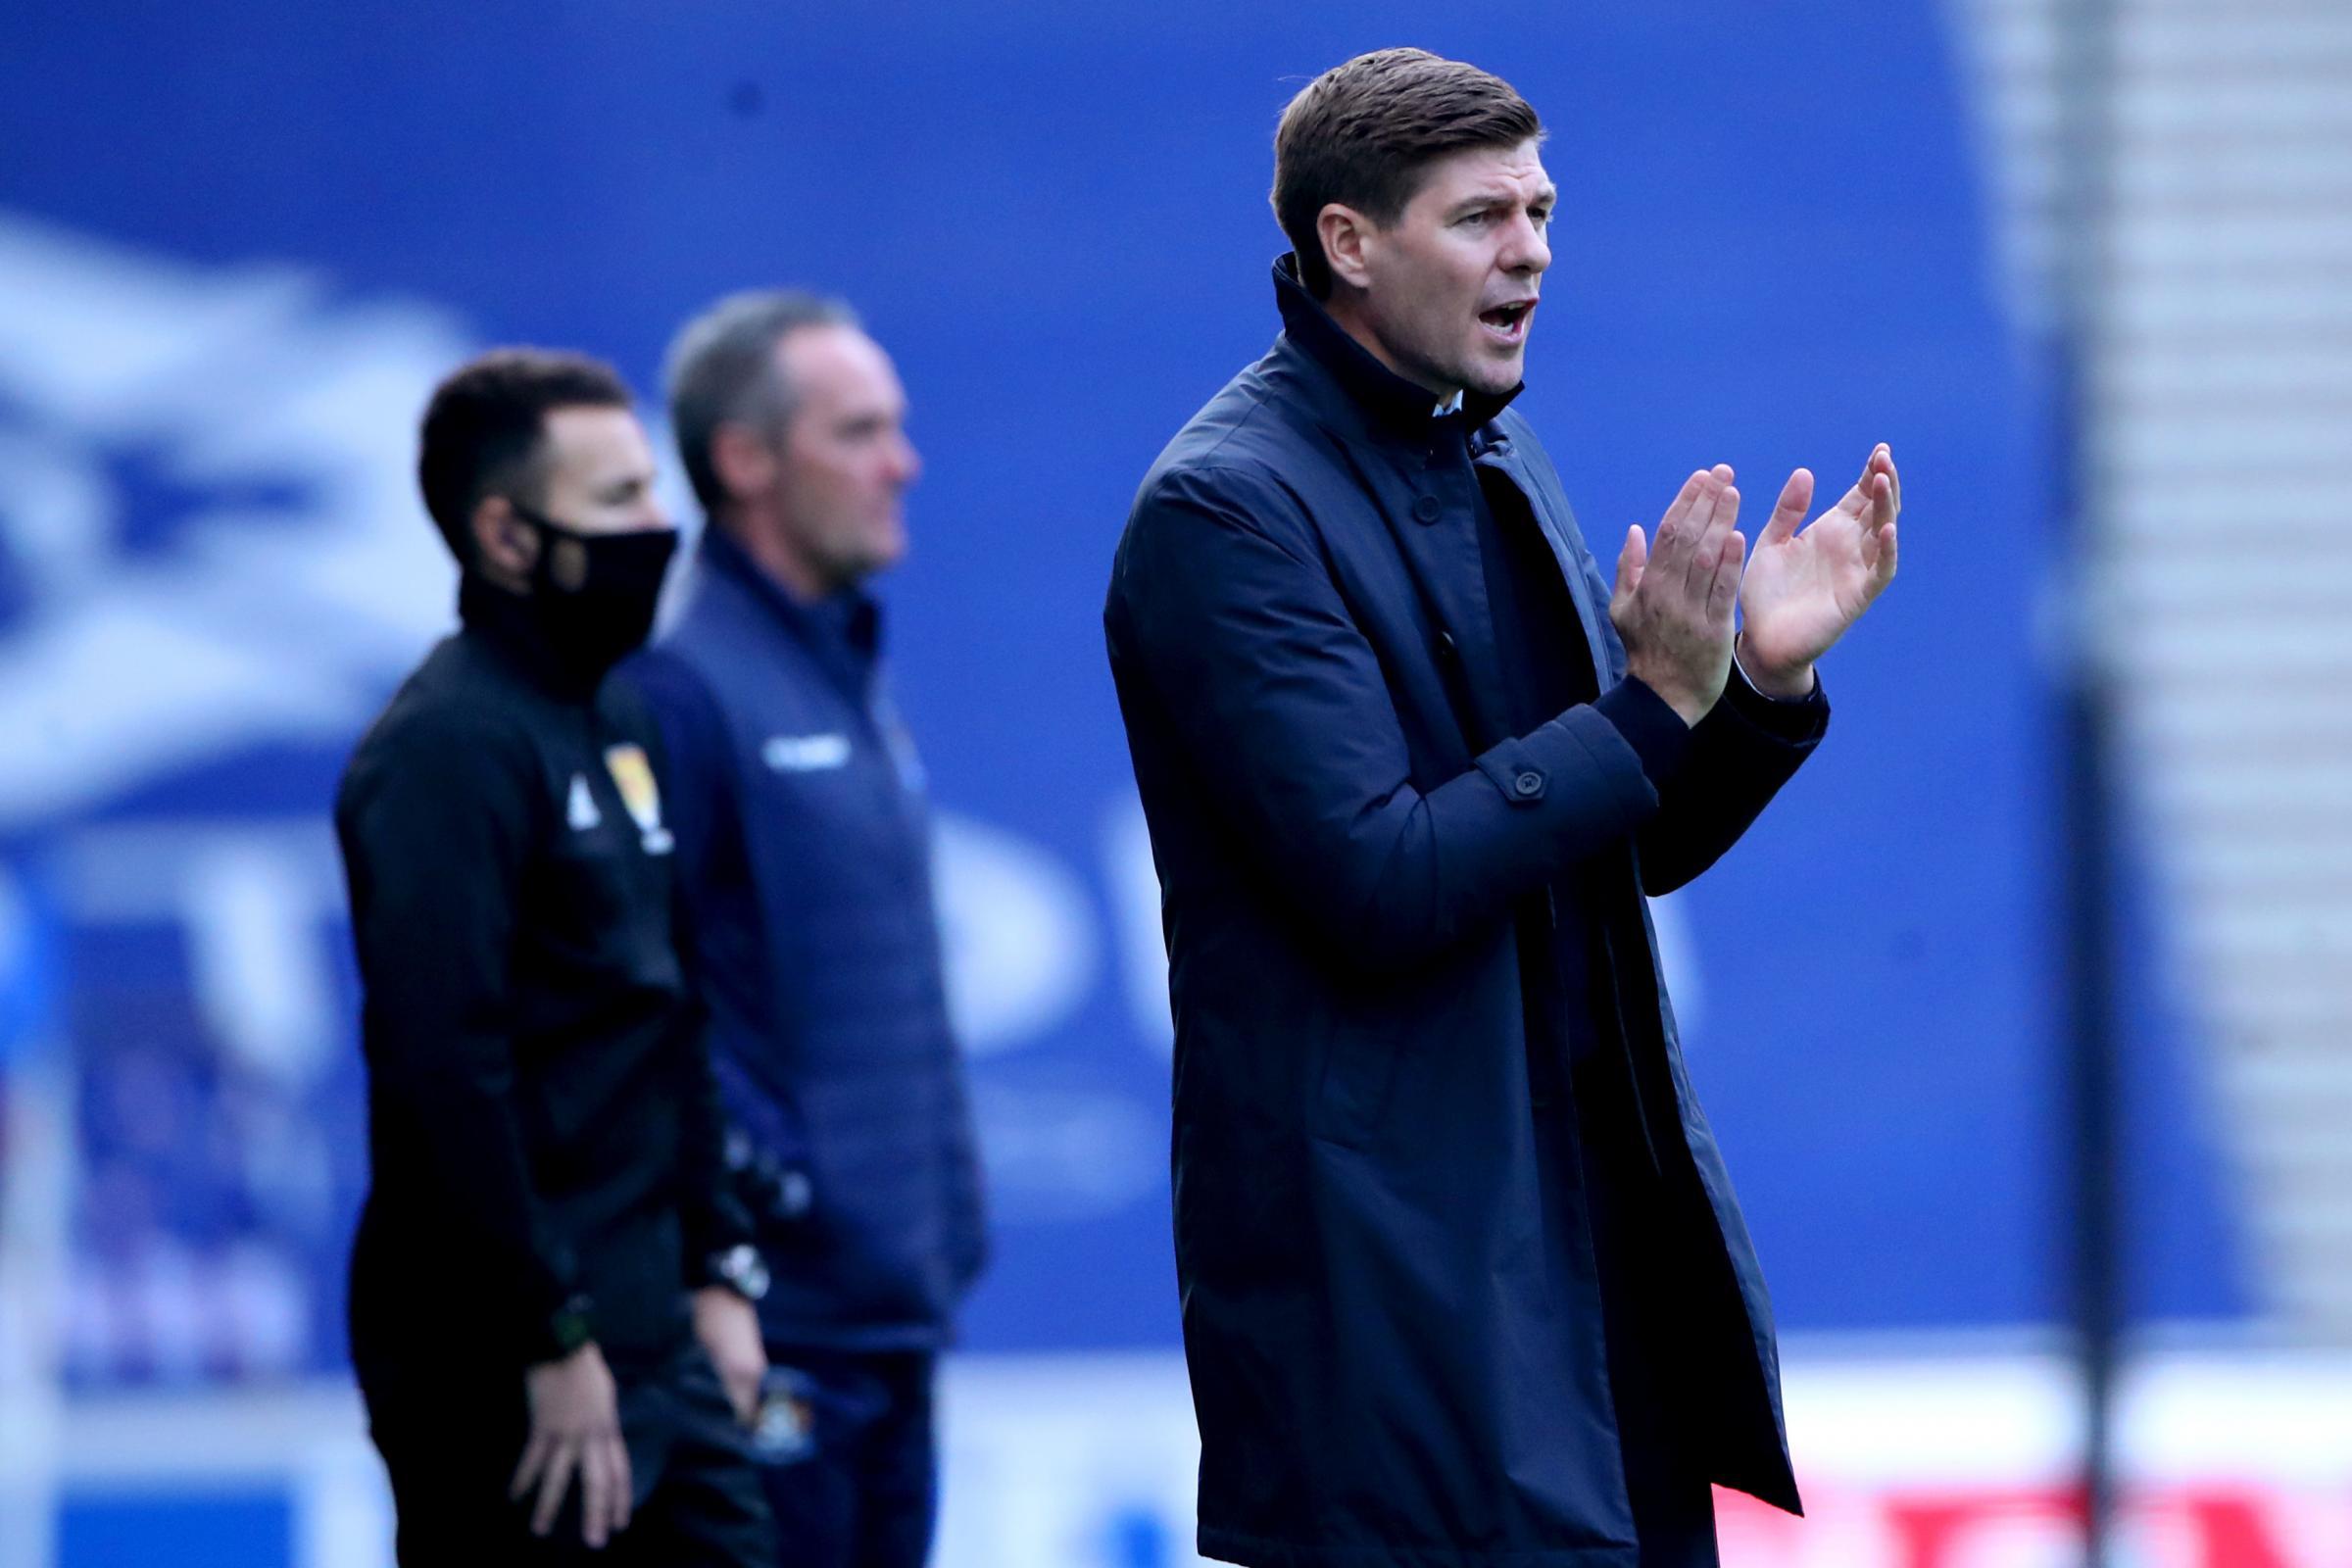 Rangers 2-0 Kilmarnock: Five talking points as Morelos misses out, Kent shines and Steven Gerrard's side break clean sheet record